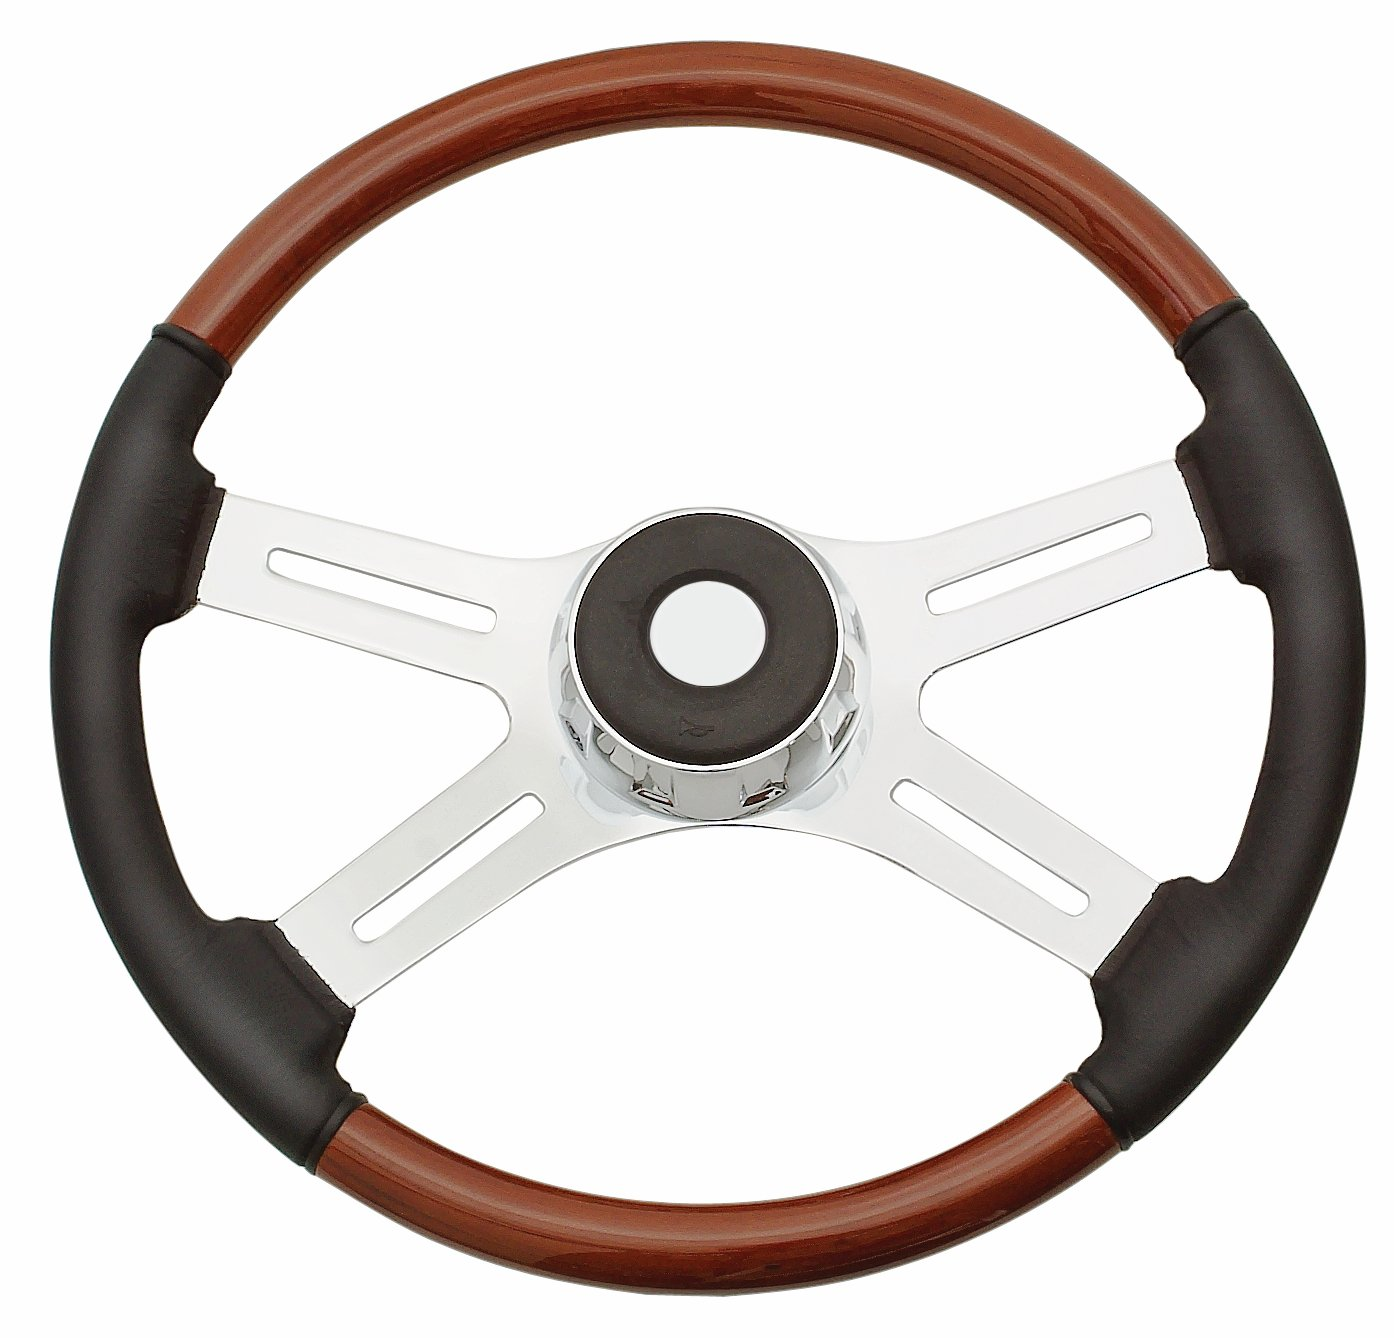 Woody's WP-SWF2008L Rosewood Chrome Truck Steering Wheel (Beautiful African Hardwood)